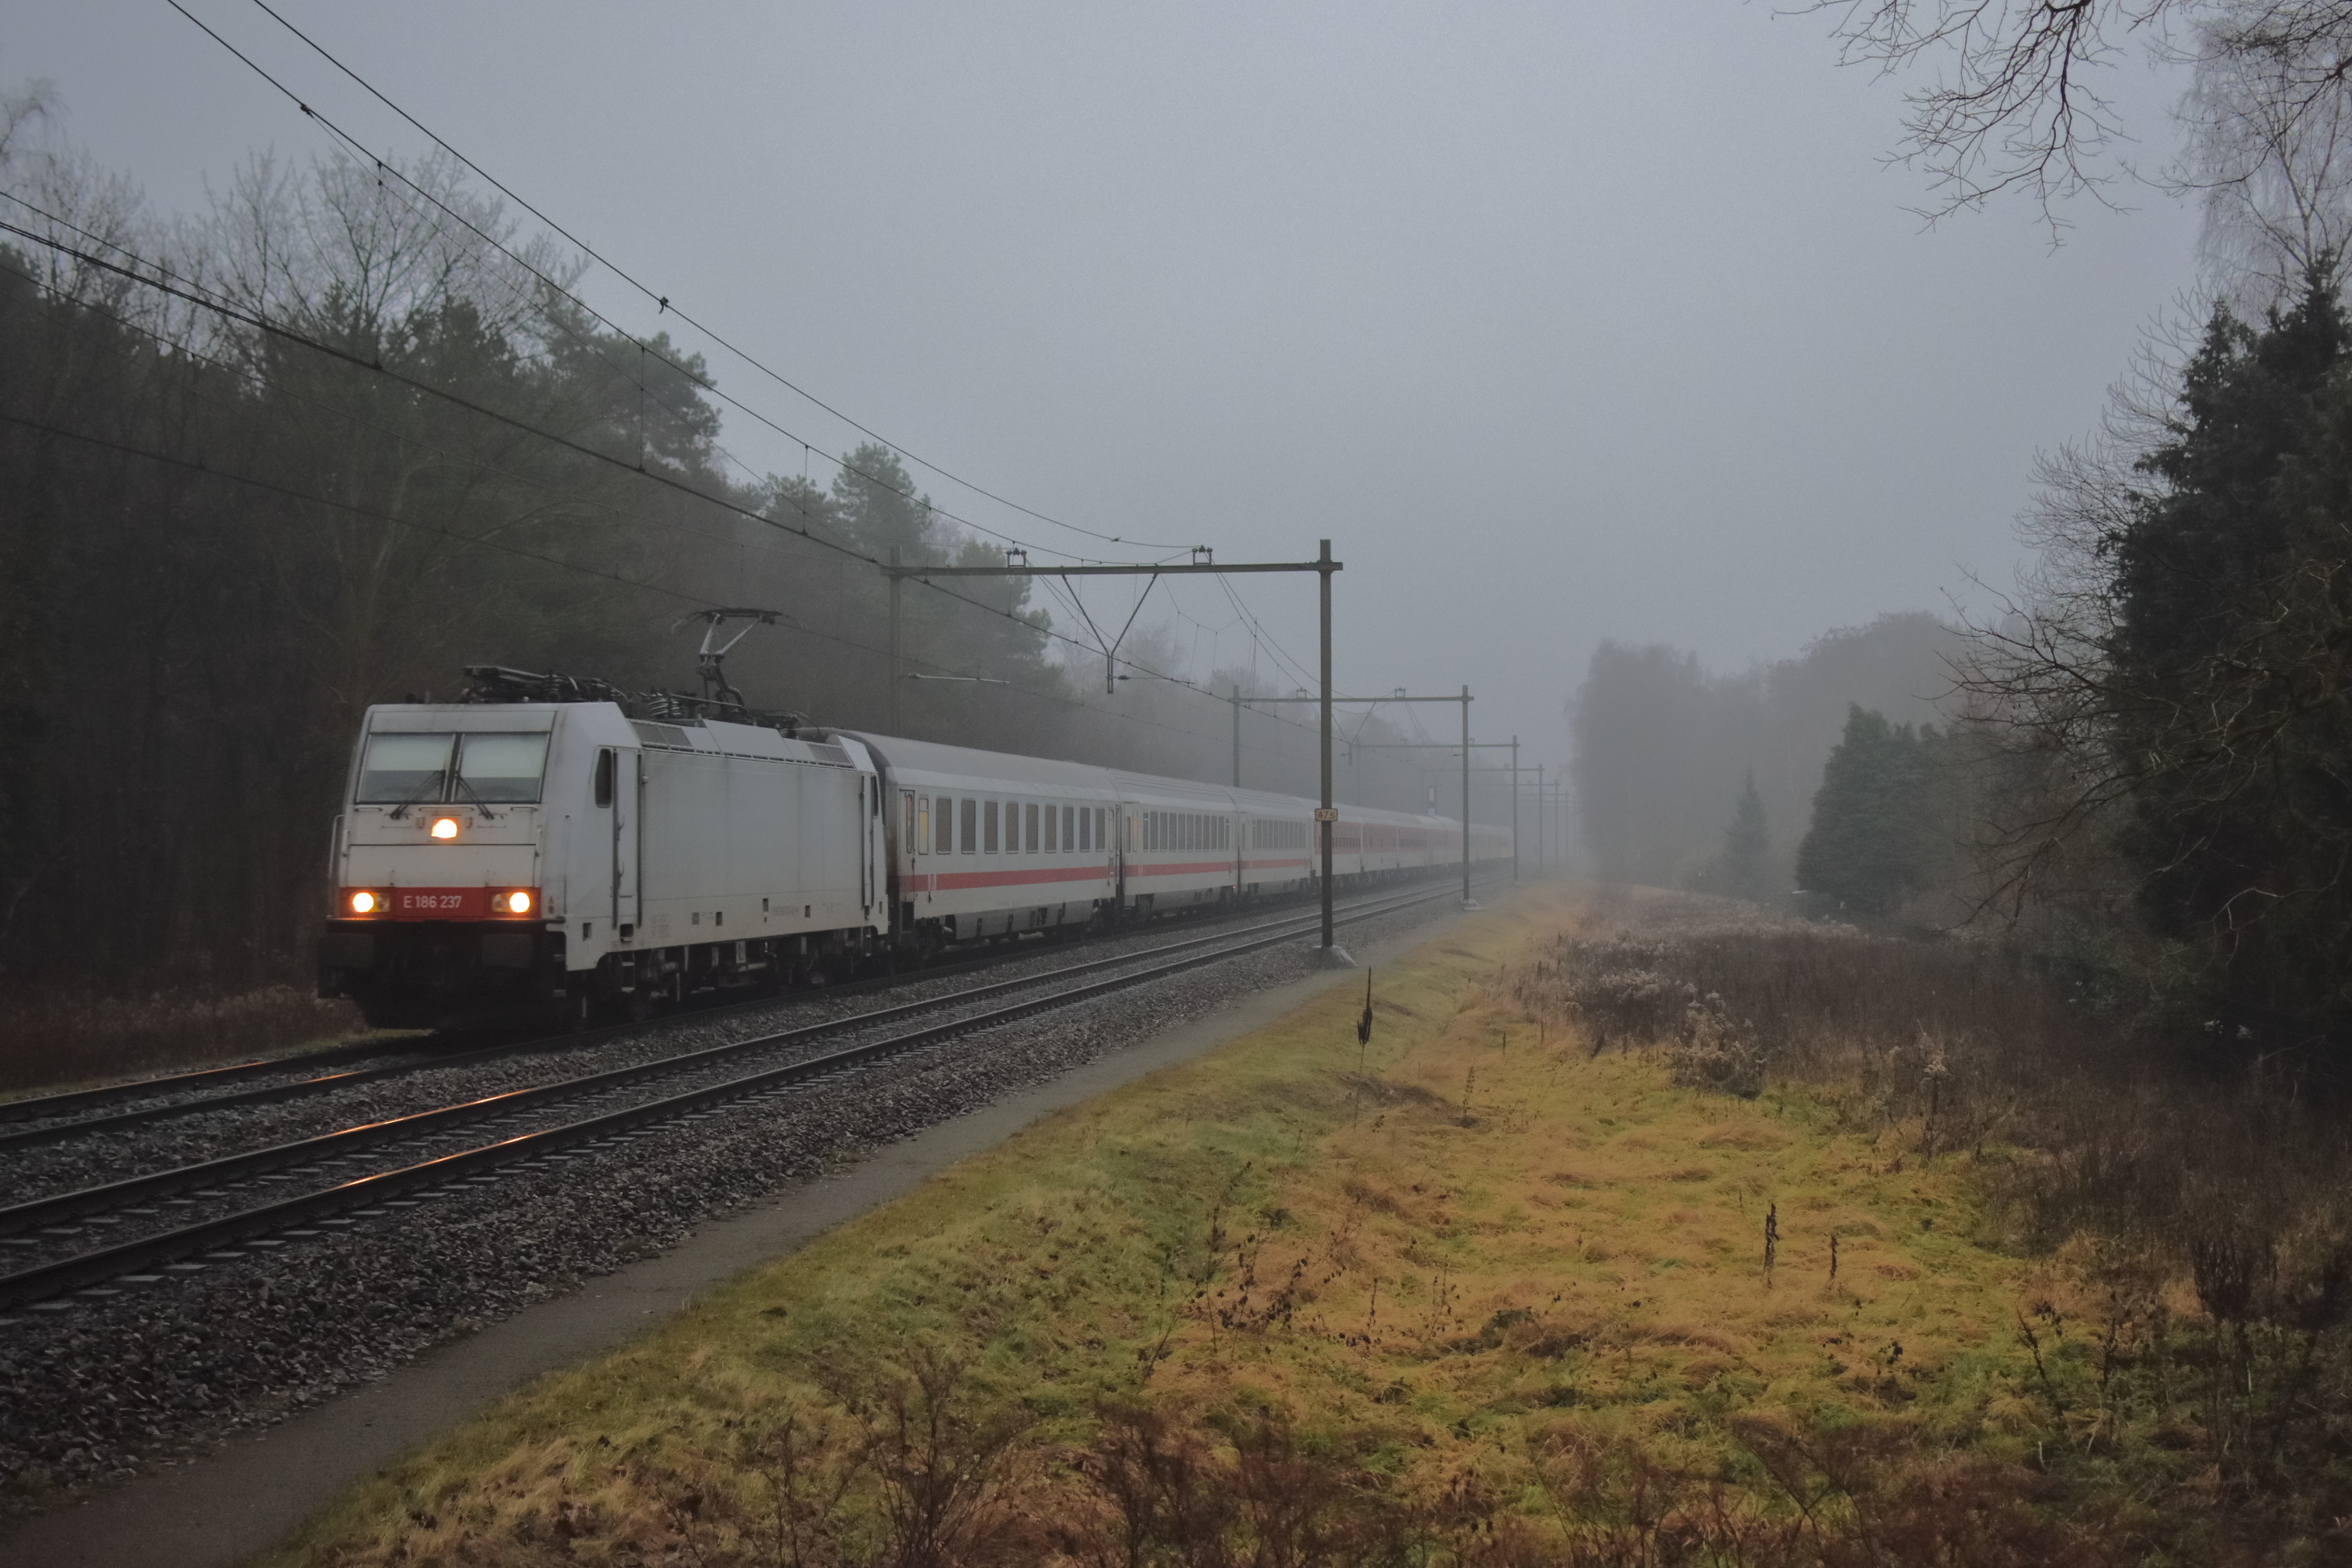 Laatste nachttrein naar Amsterdam op vrijdagochtend 9 december 2016 onderweg bij Driebergen ©Herman Brüheim